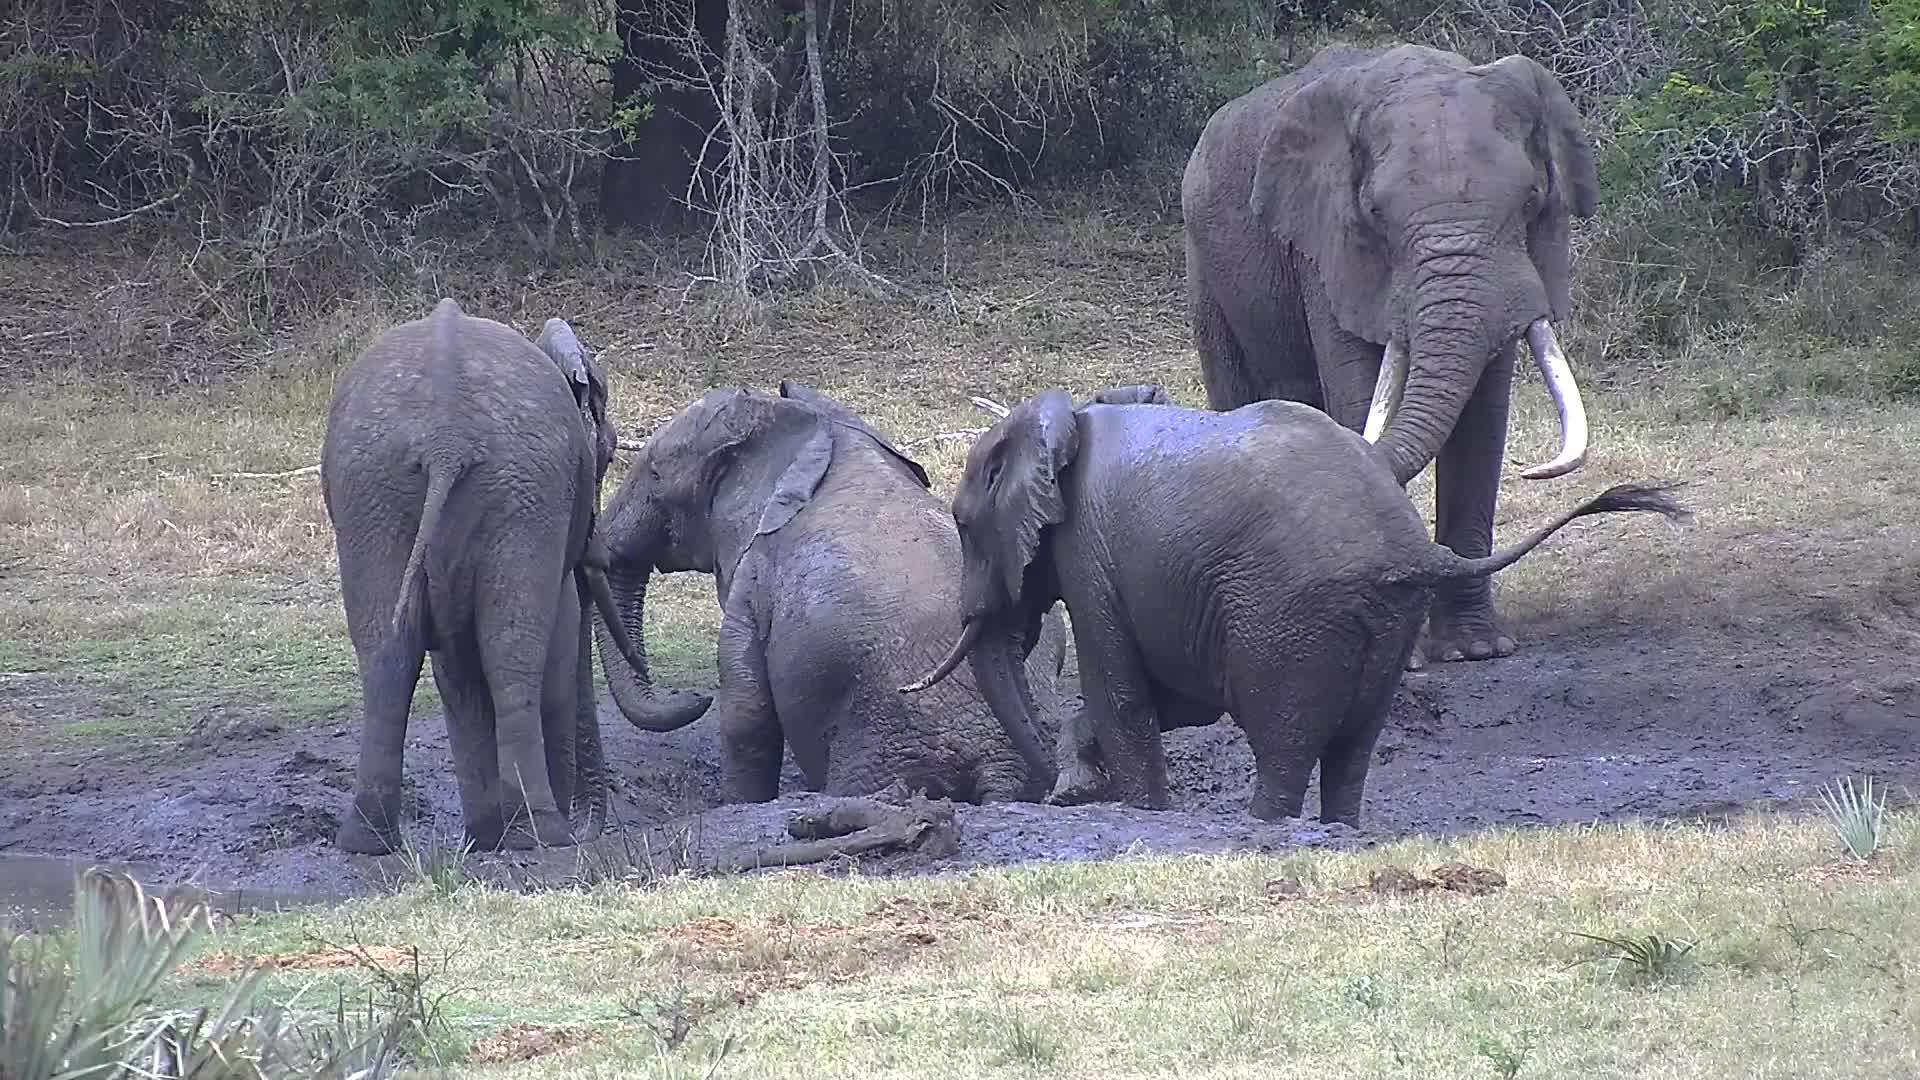 VIDEO: Elephants enjoy the mud puddles next the waterhole